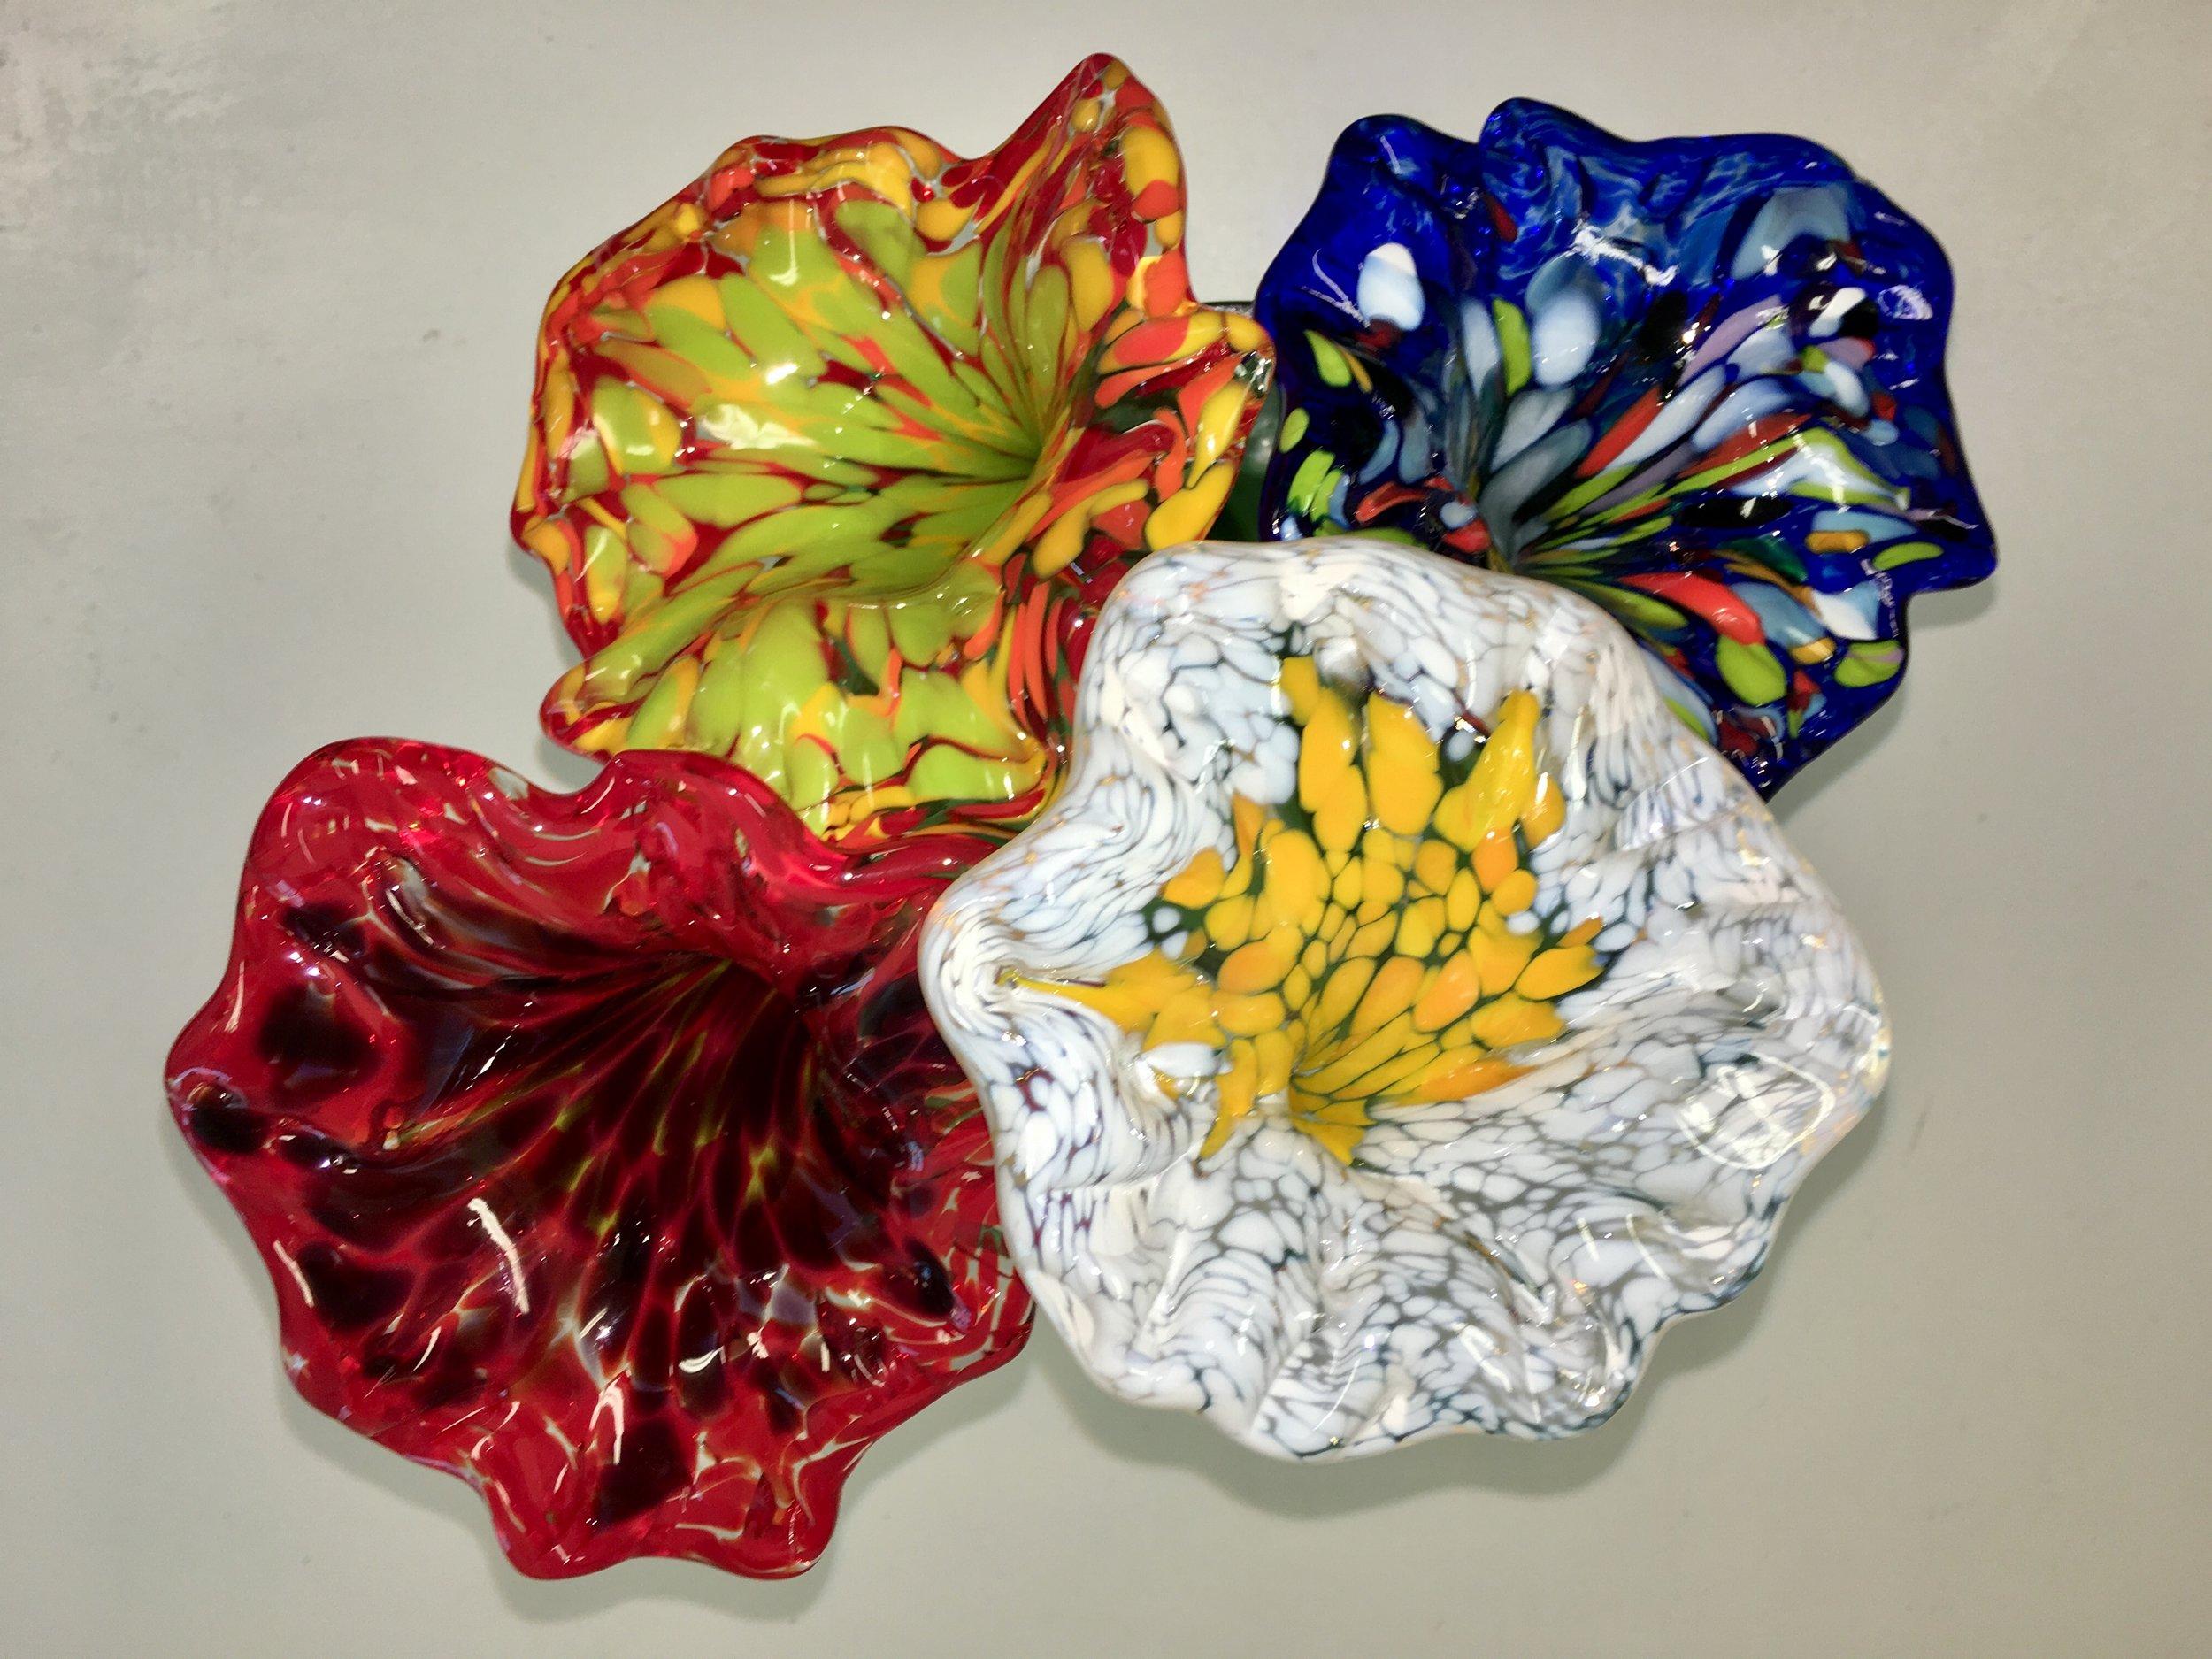 glass flowers1.jpg